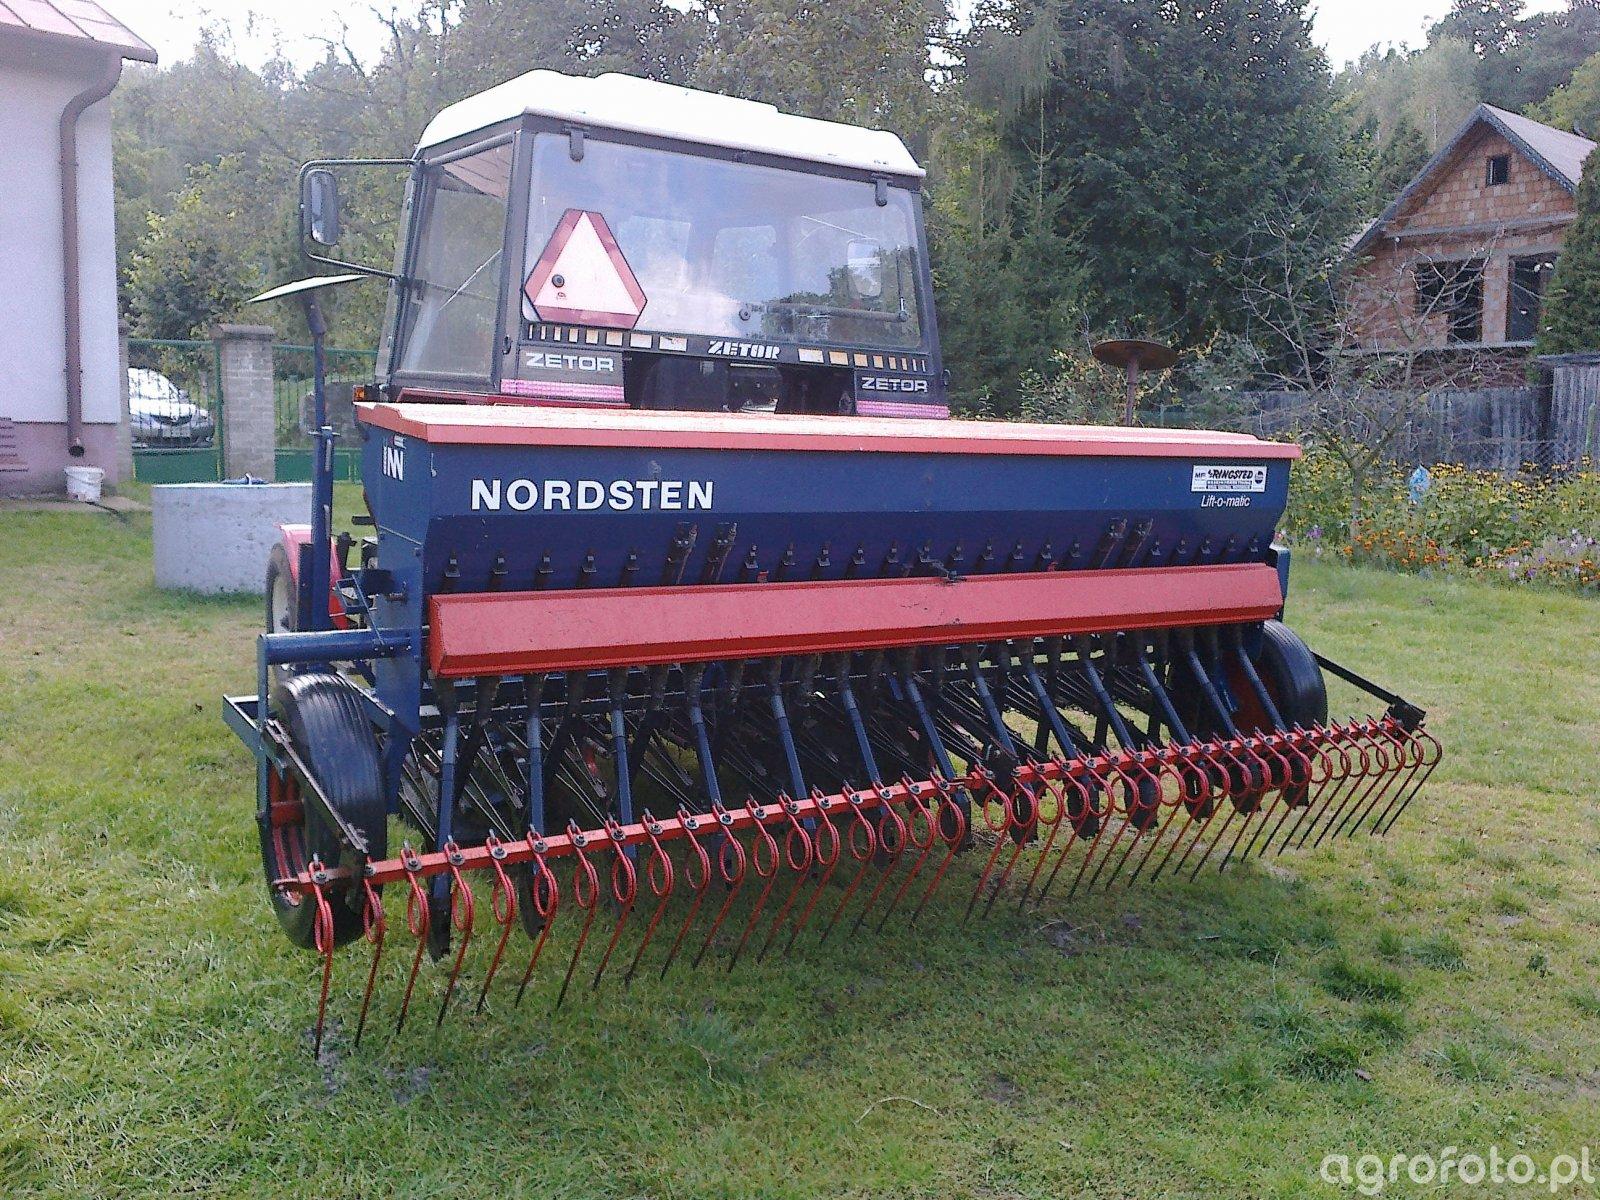 Nordsten Lifto matic CLB 300 MK II